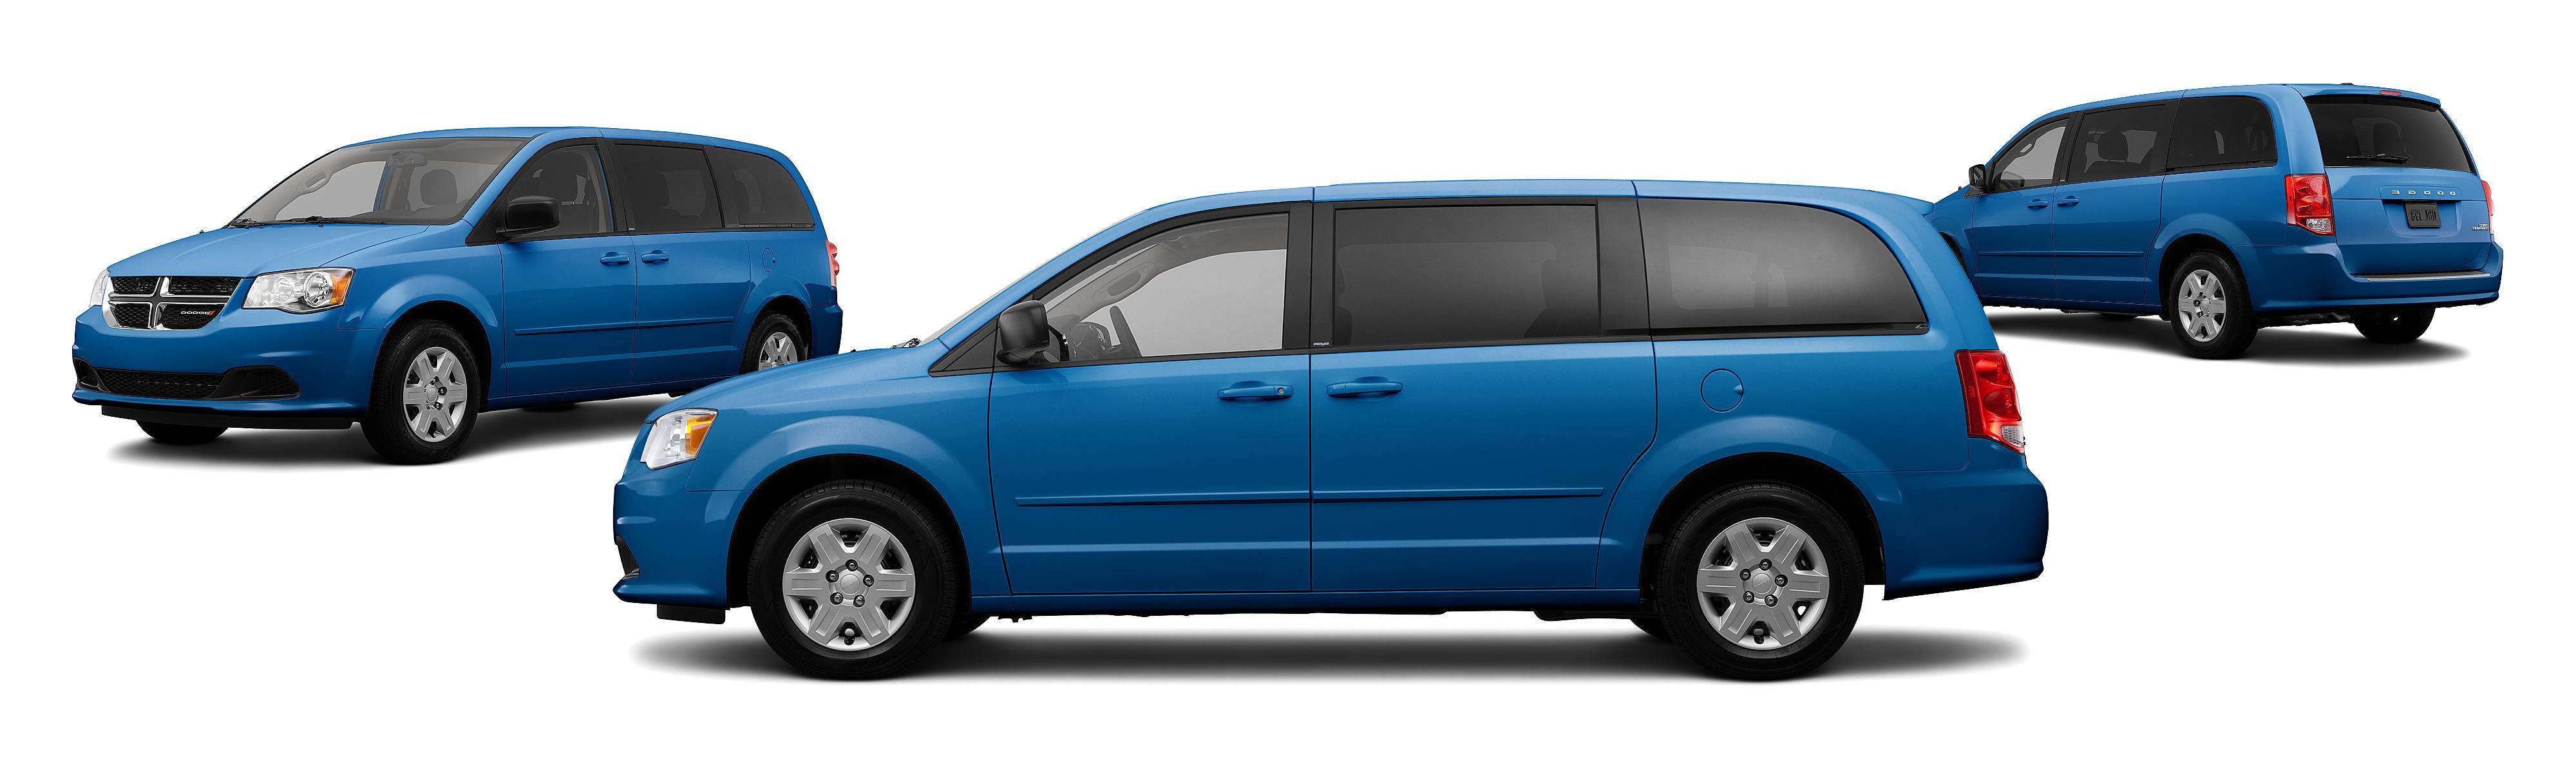 2013 Dodge Grand Caravan R T 4dr Mini Van Research Groovecar